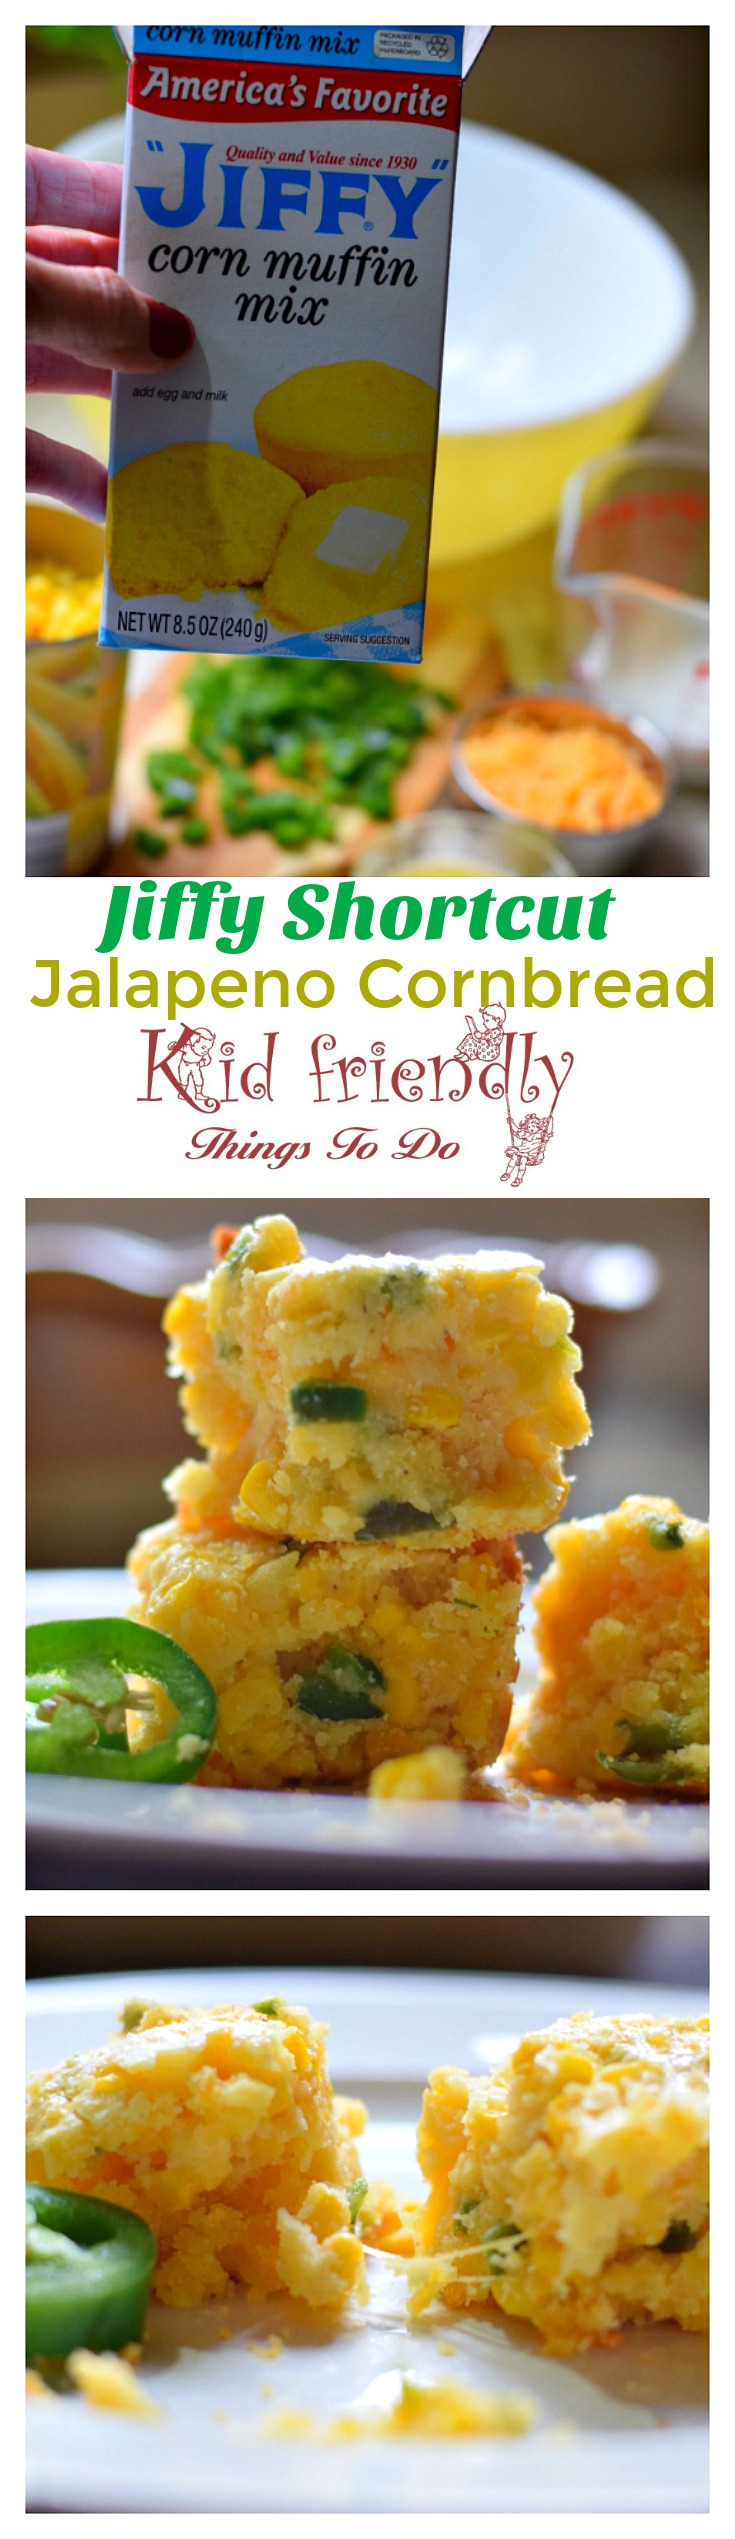 Shortcut Jiffy Jalapeno Cheddar Mexican Cornbread Recipe